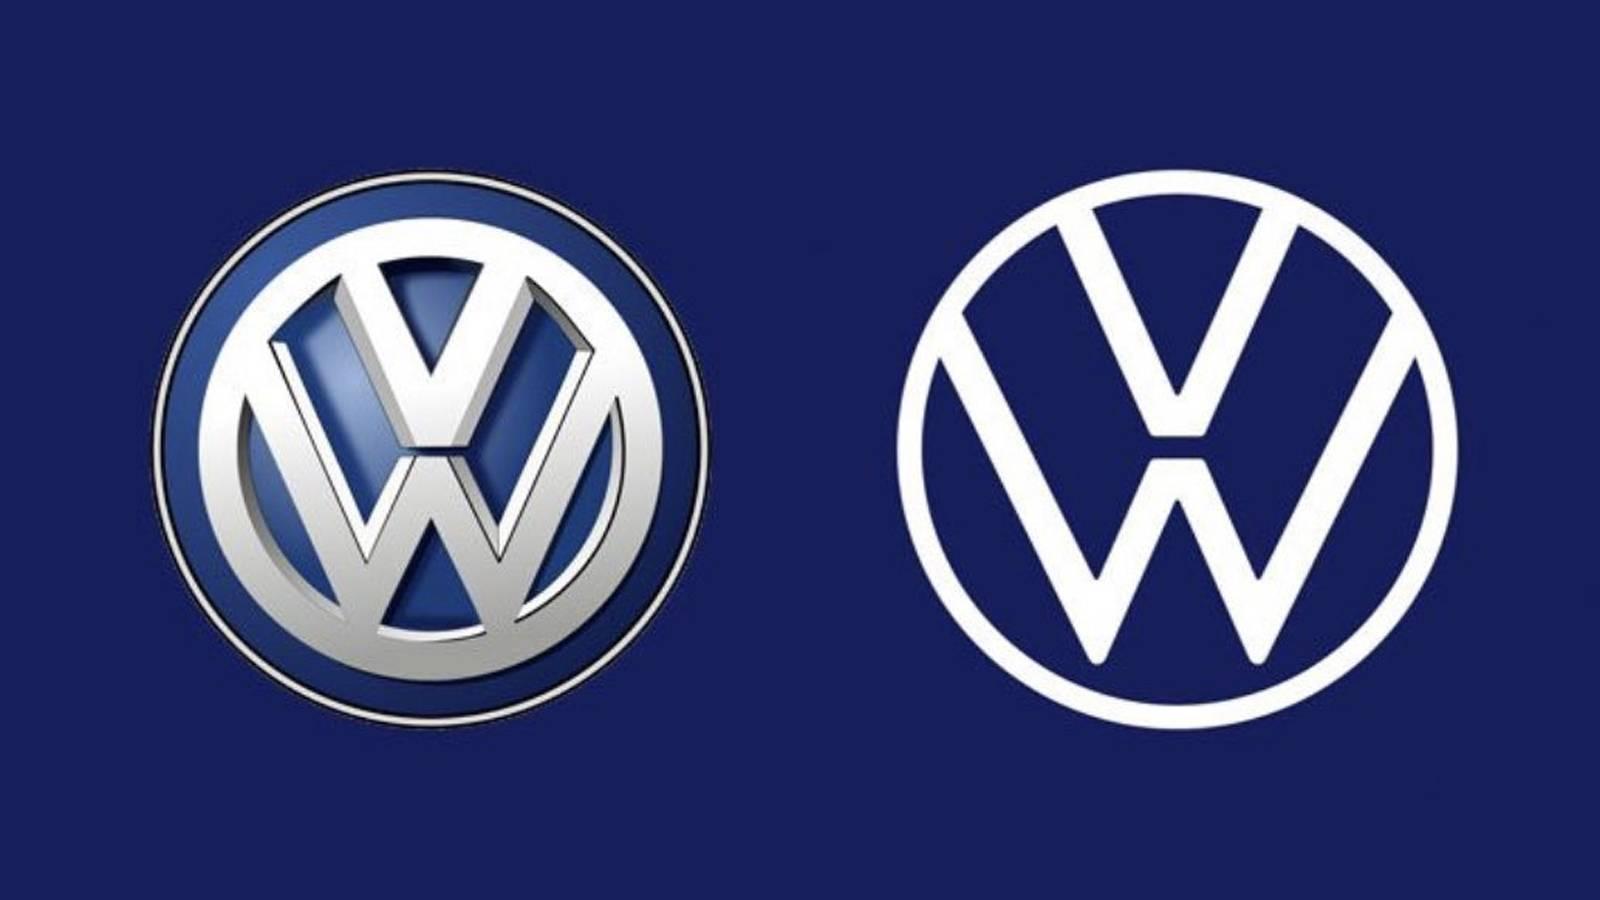 Vorher vs. Nachher VW-Logo | Quelle: stern.de ©VW